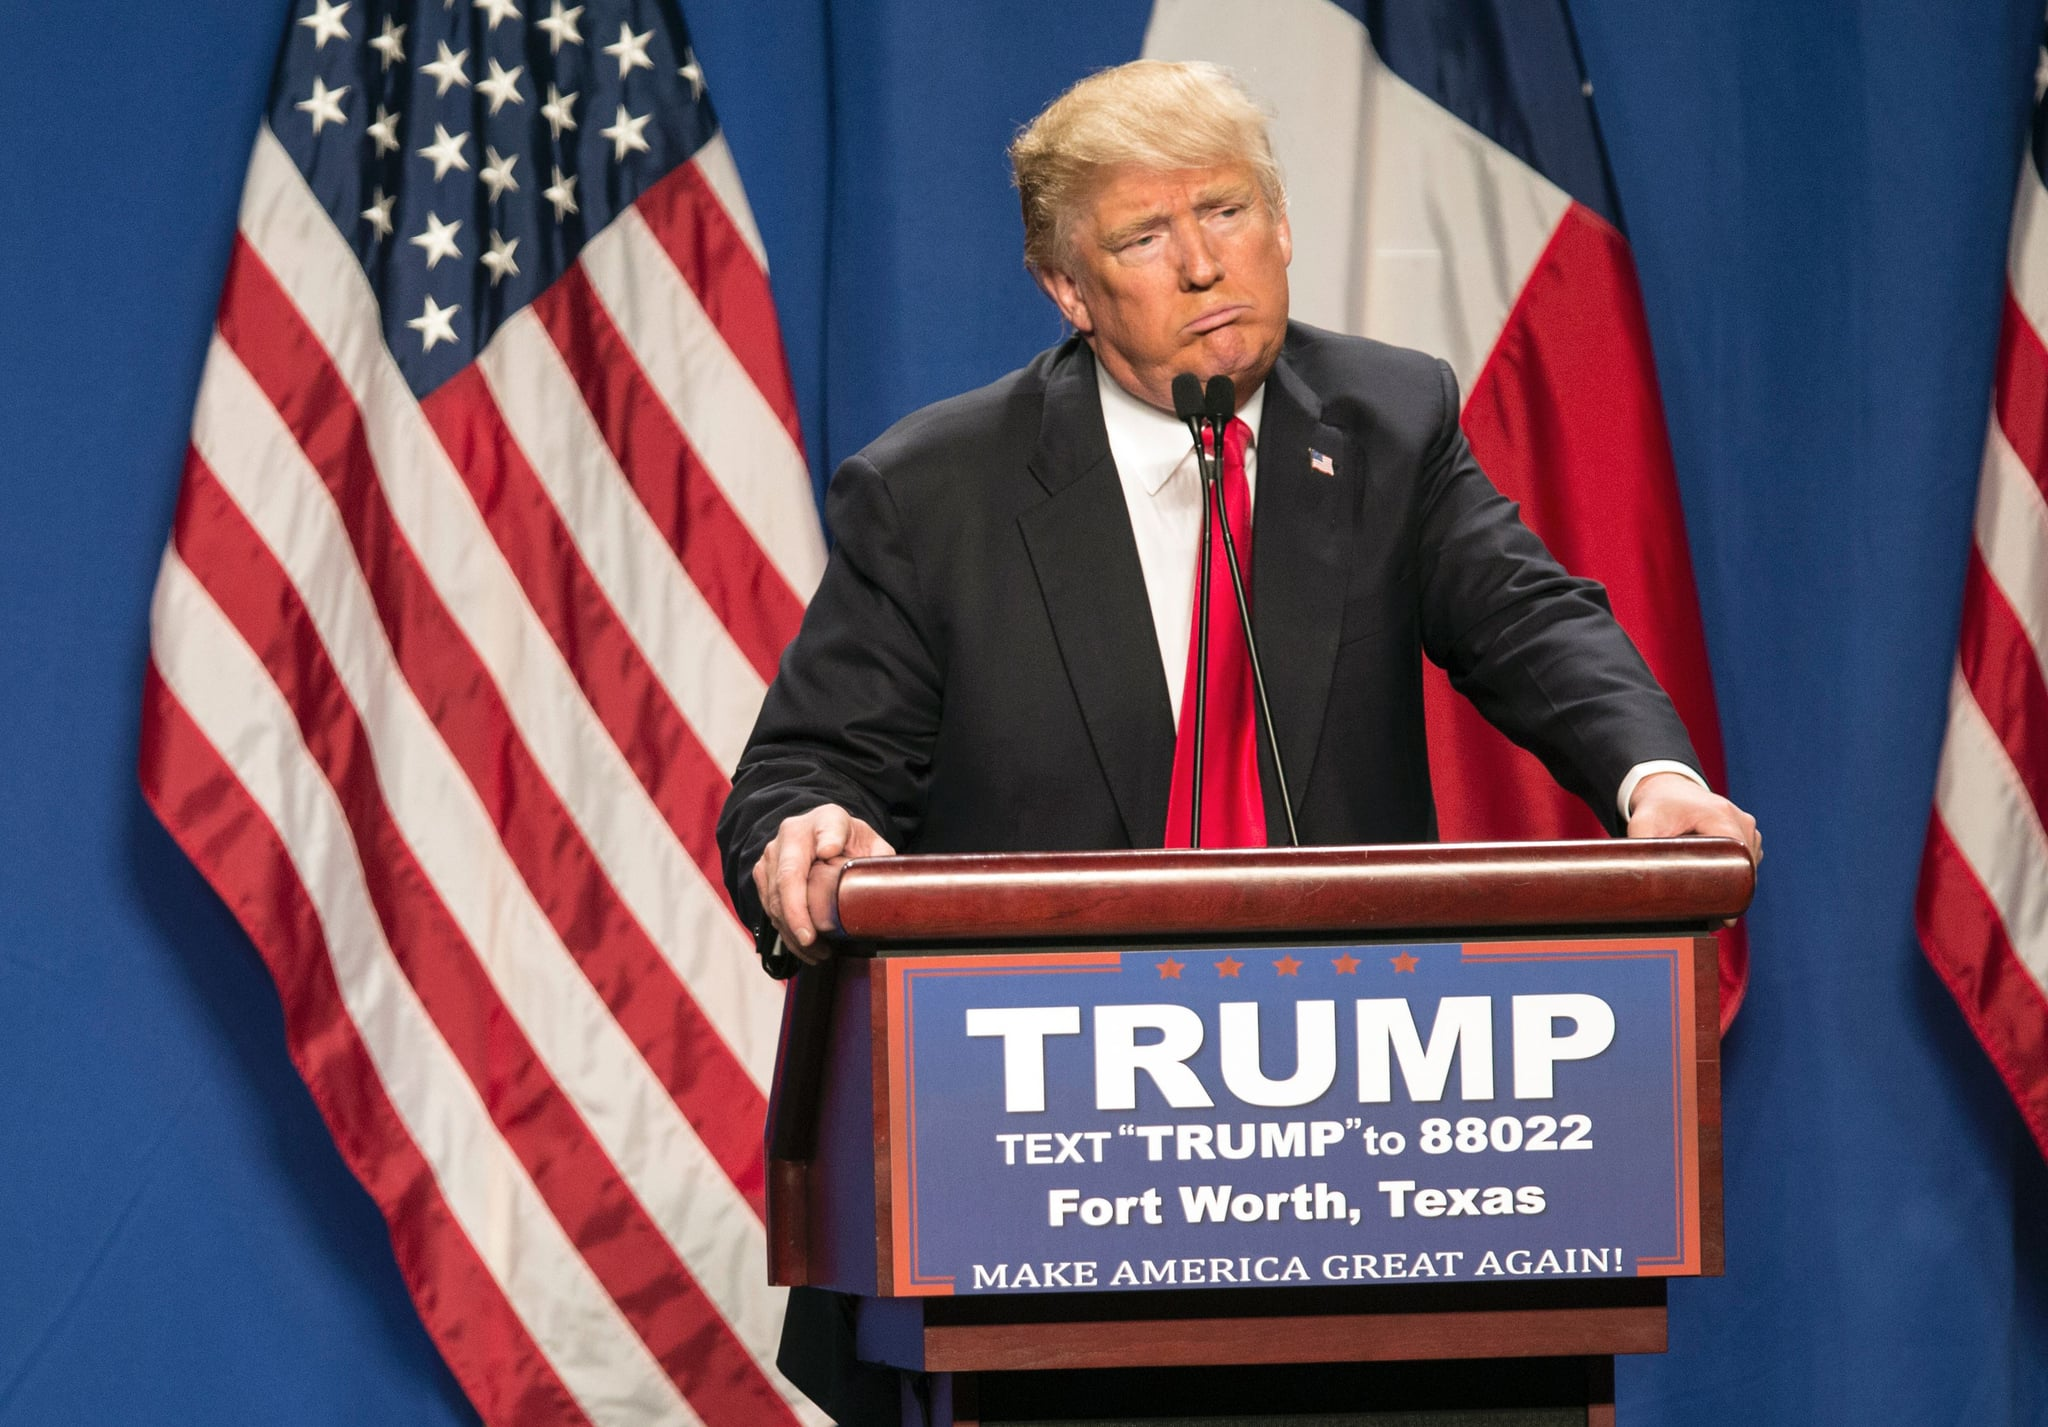 6 Reasons Donald Trump Won't Be President